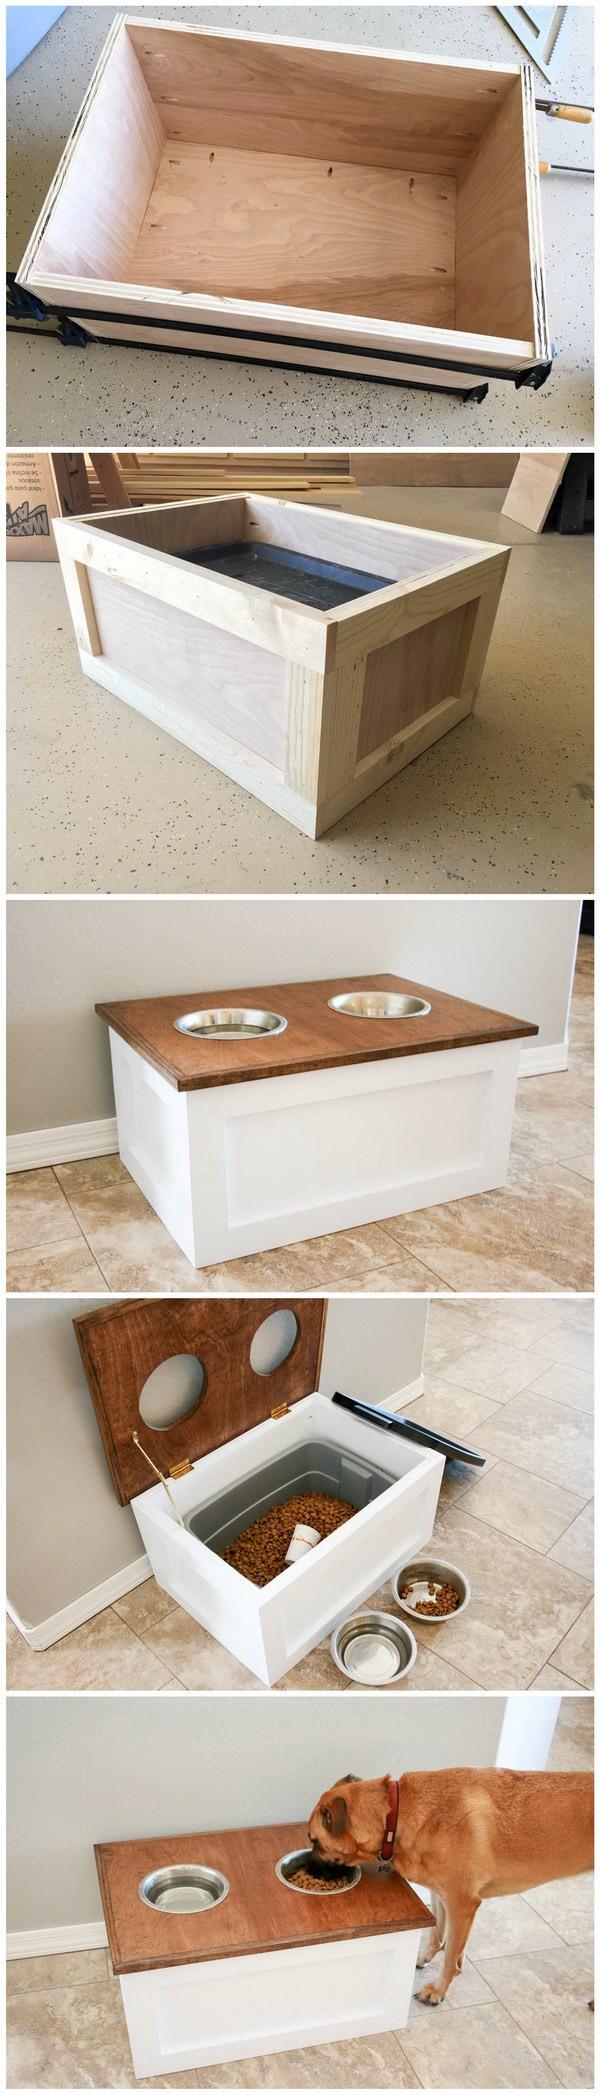 DIY Dog Food Storage  26 Quick Furniture Makeover DIYs – Page 21 – Great DIYs